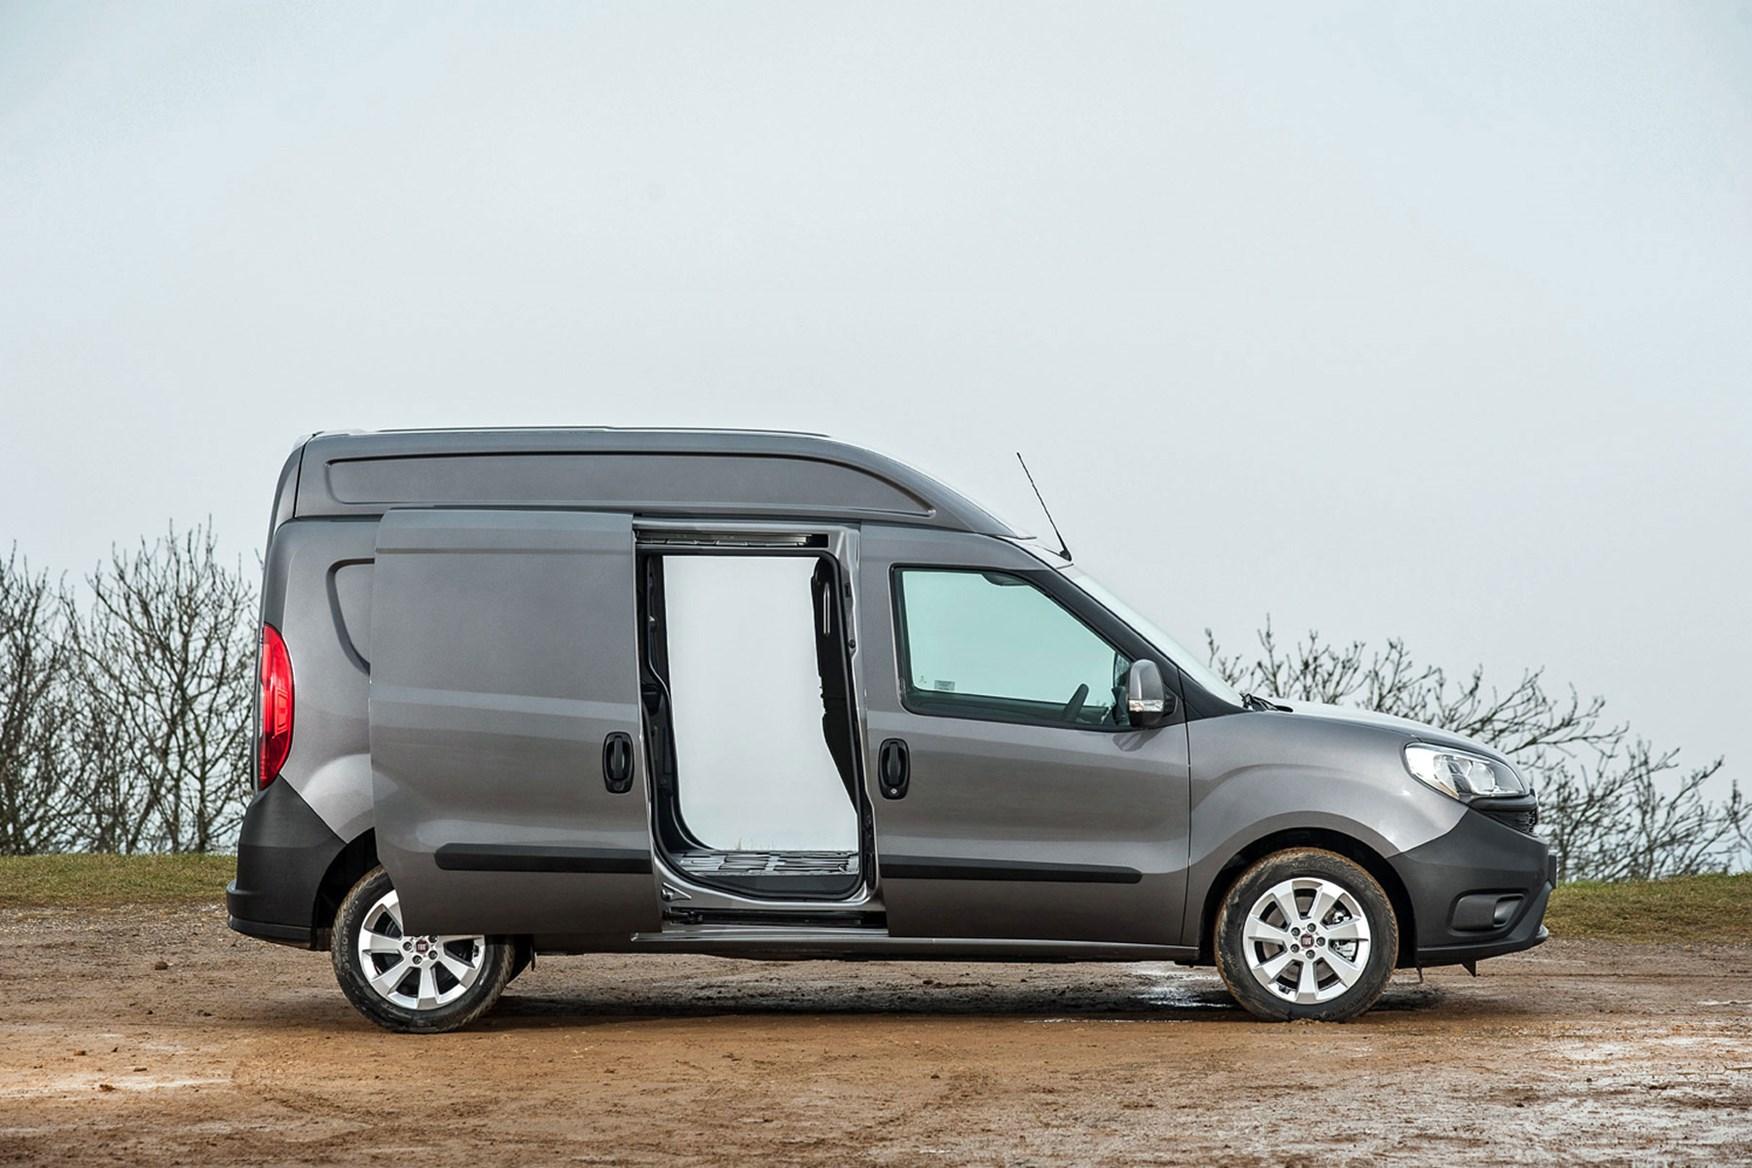 Fiat Doblo Cargo XL - side view, doors open